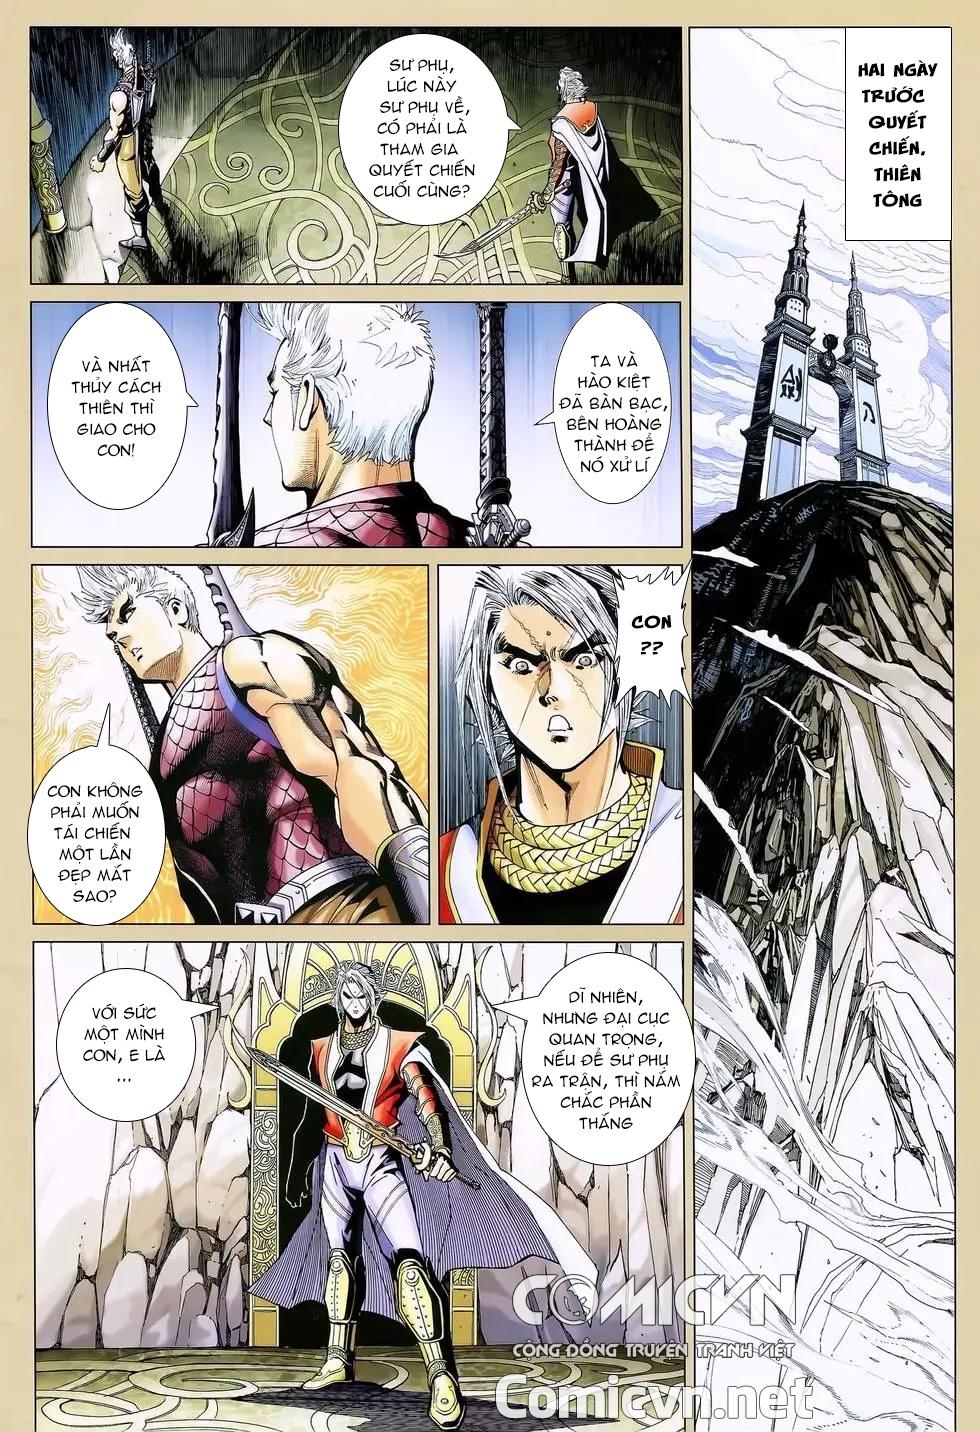 Thần binh huyền kỳ 3 - 3.5 Chapter 187 - Hamtruyen.vn